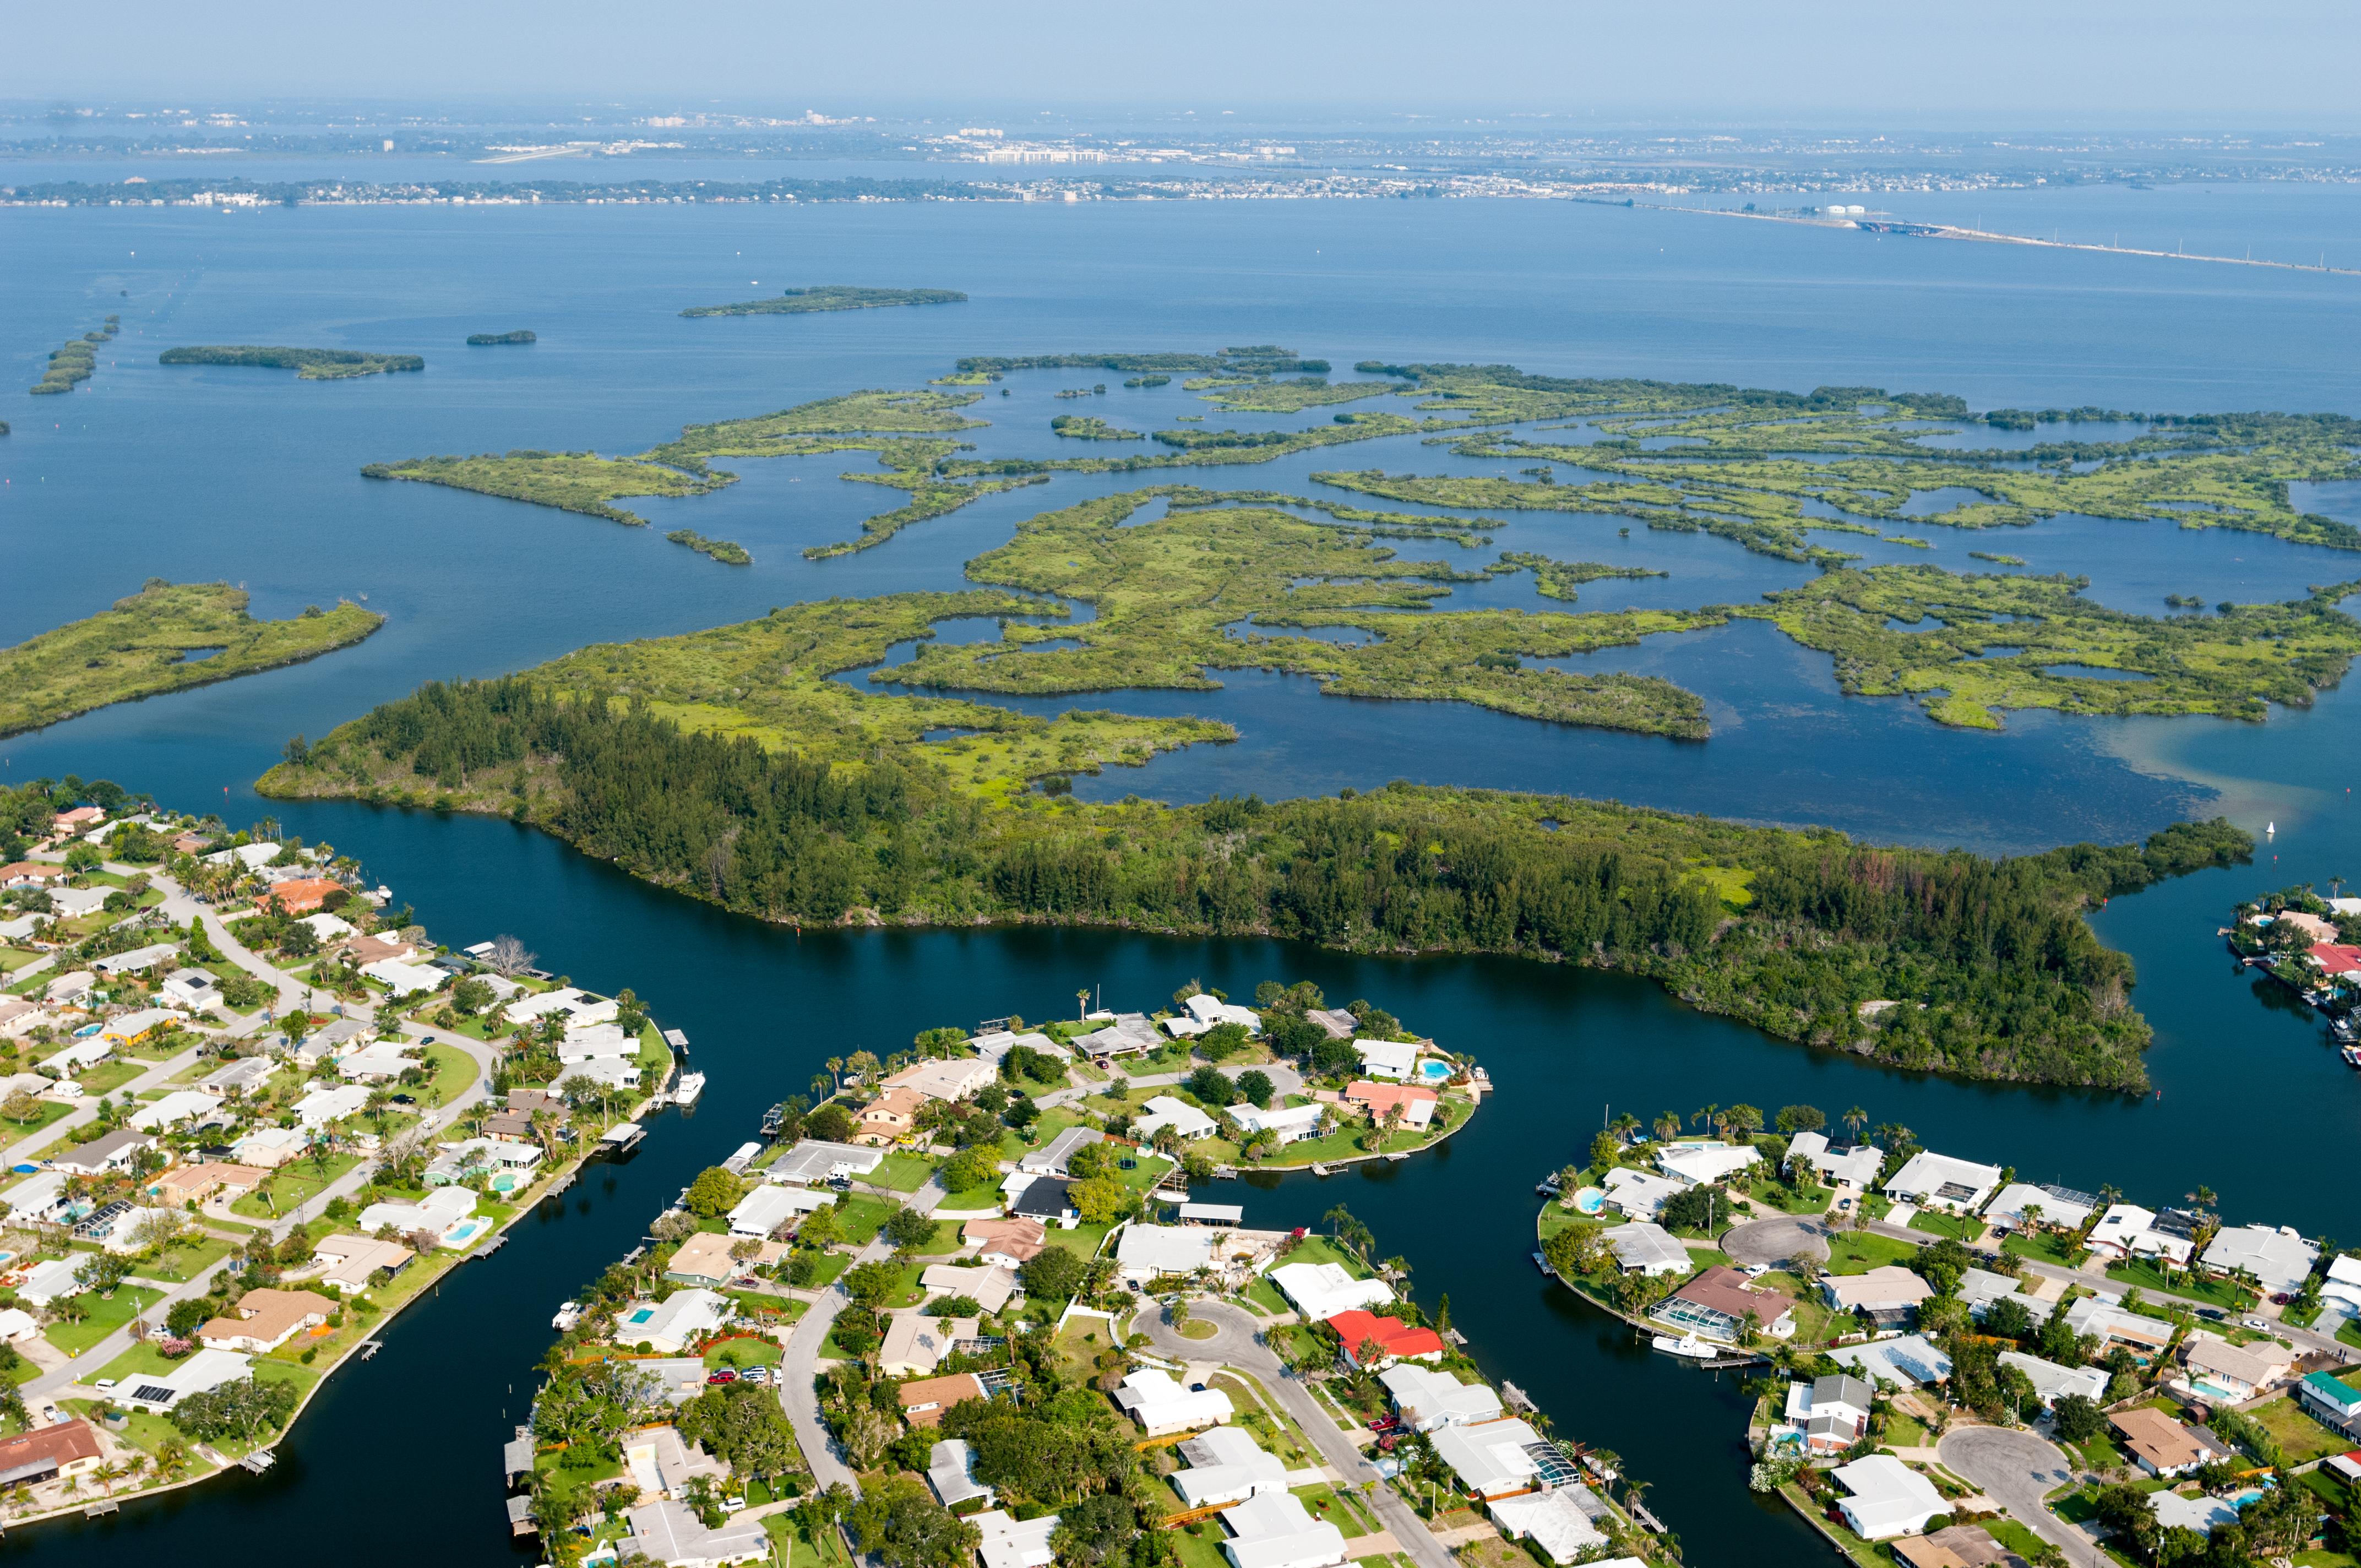 Aerial of development along the Banana River